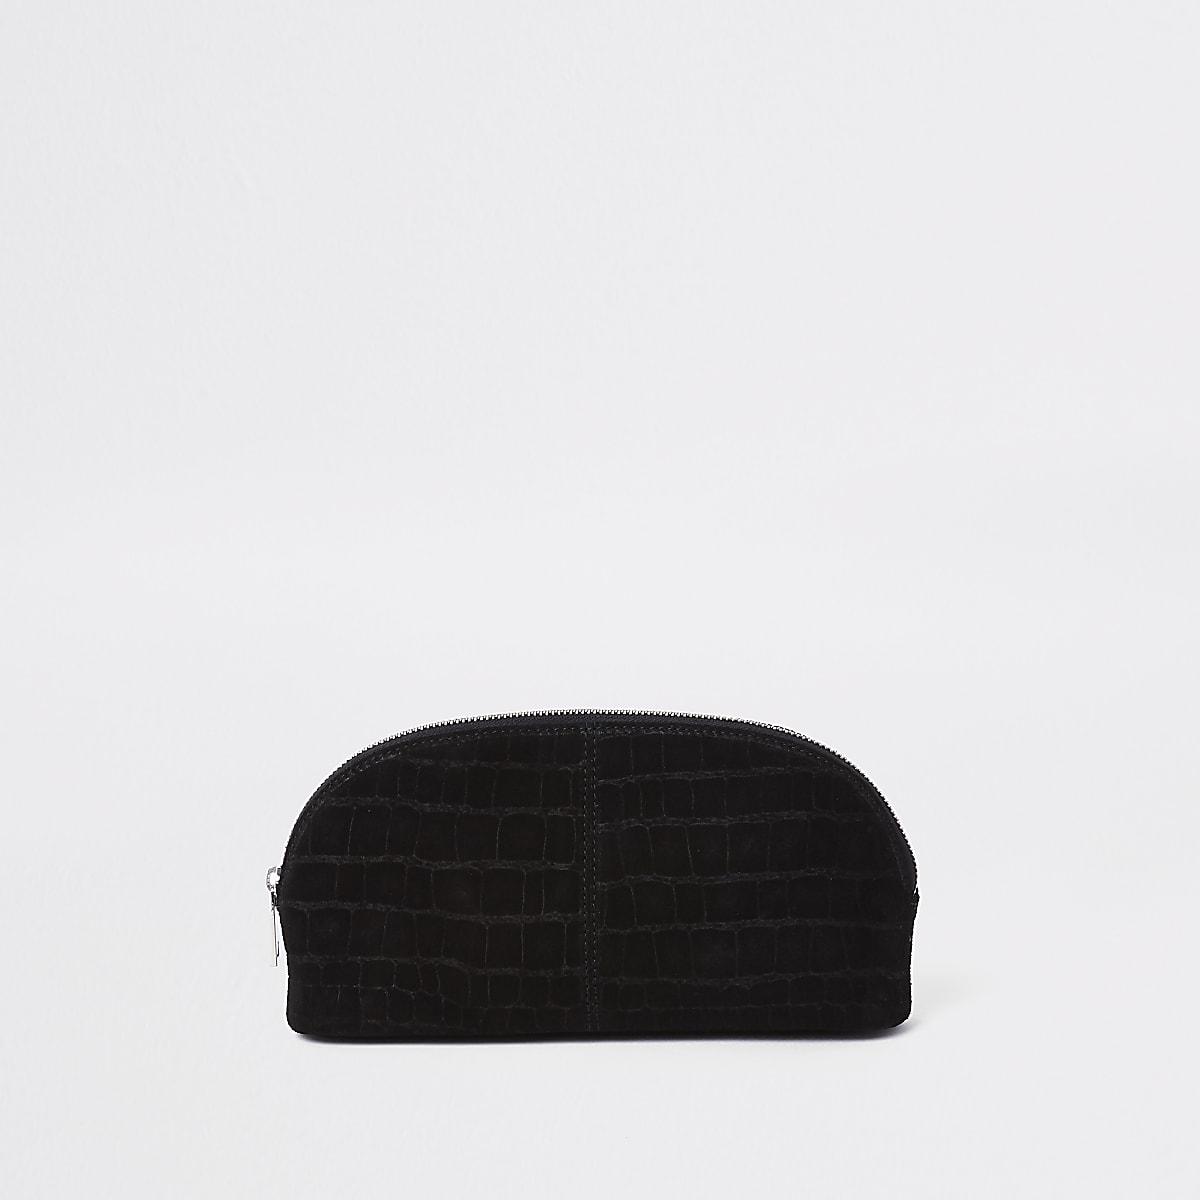 Black leather croc makeup bag